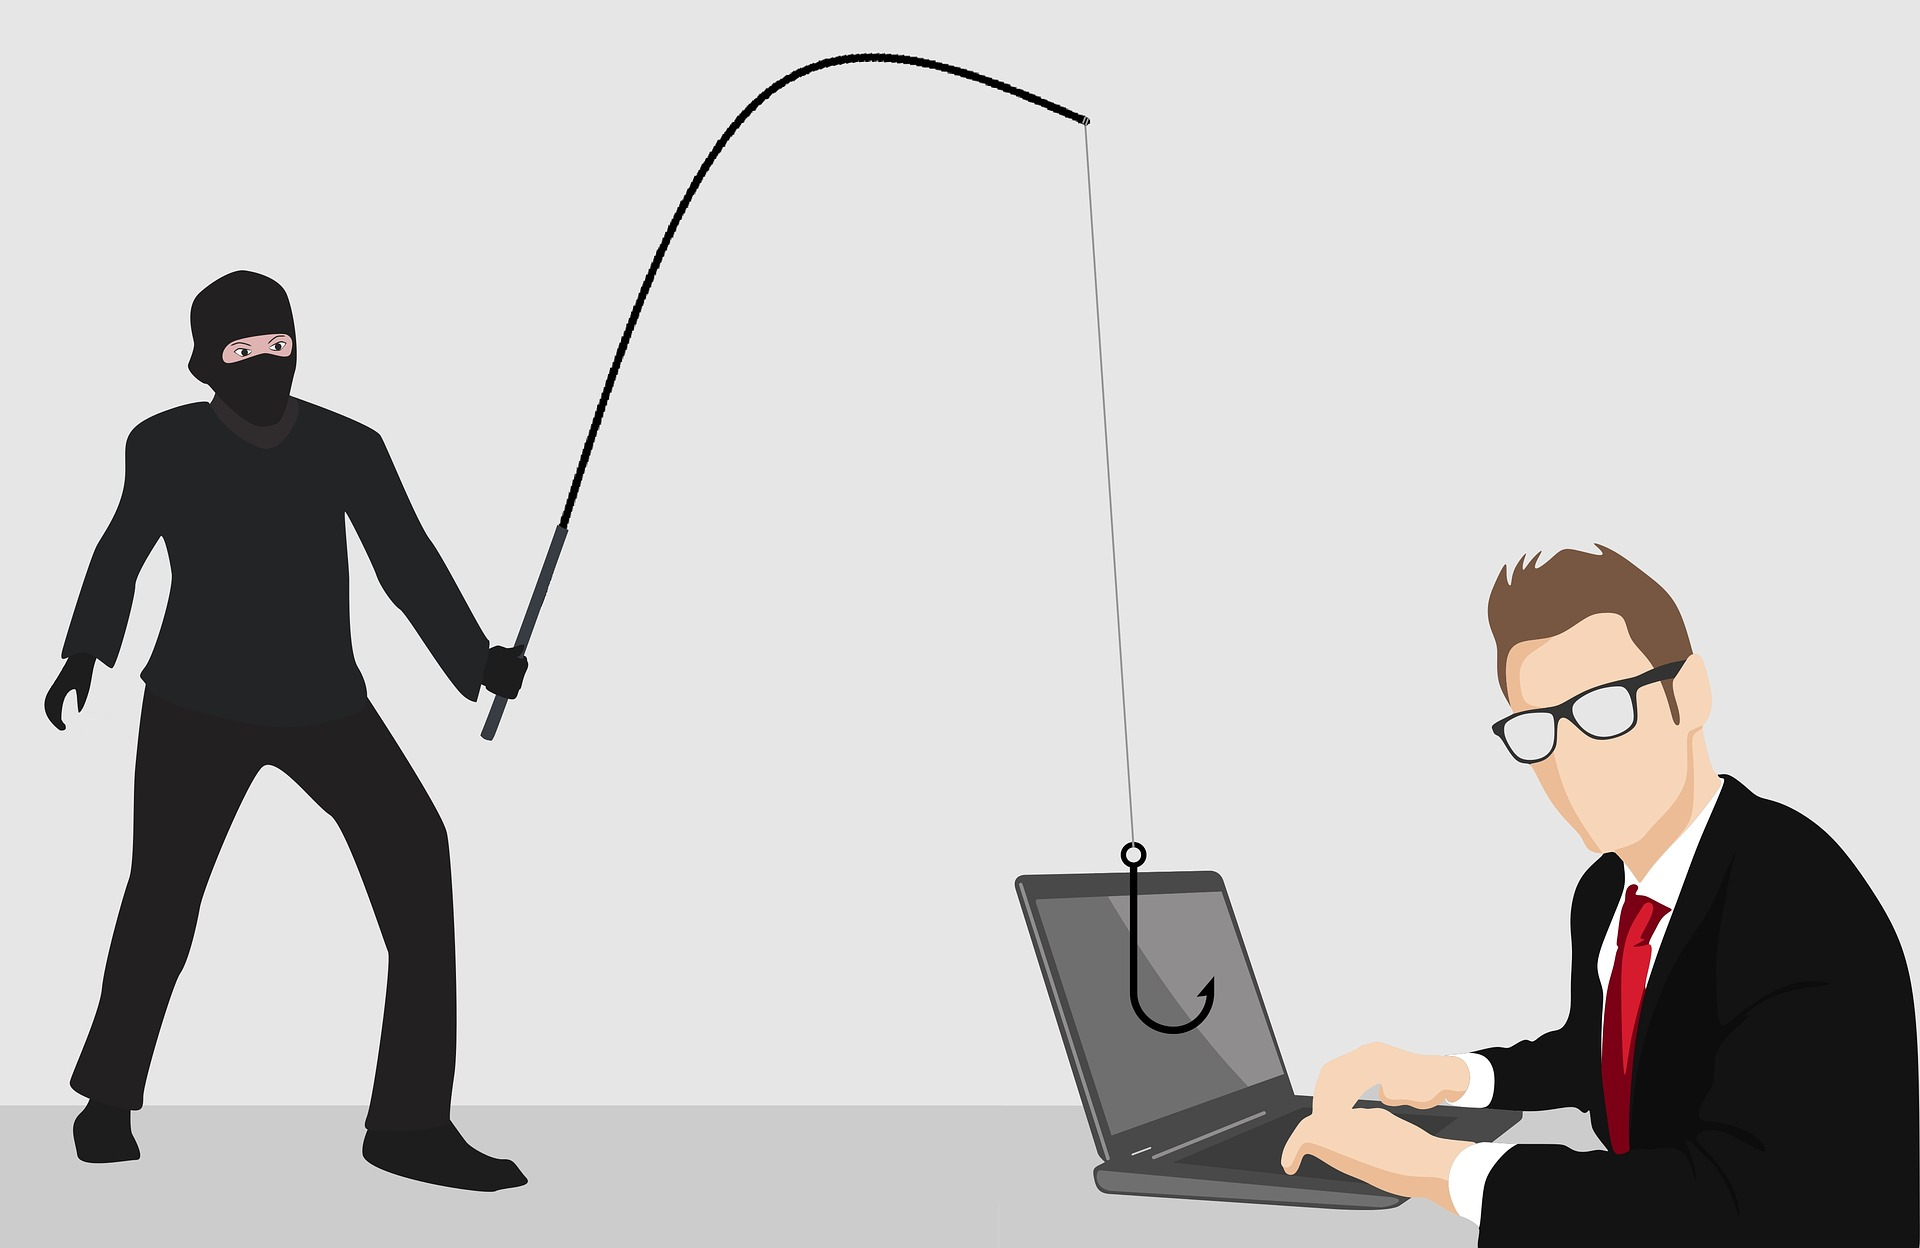 Beware of St. George Bank Online Phishing Scams